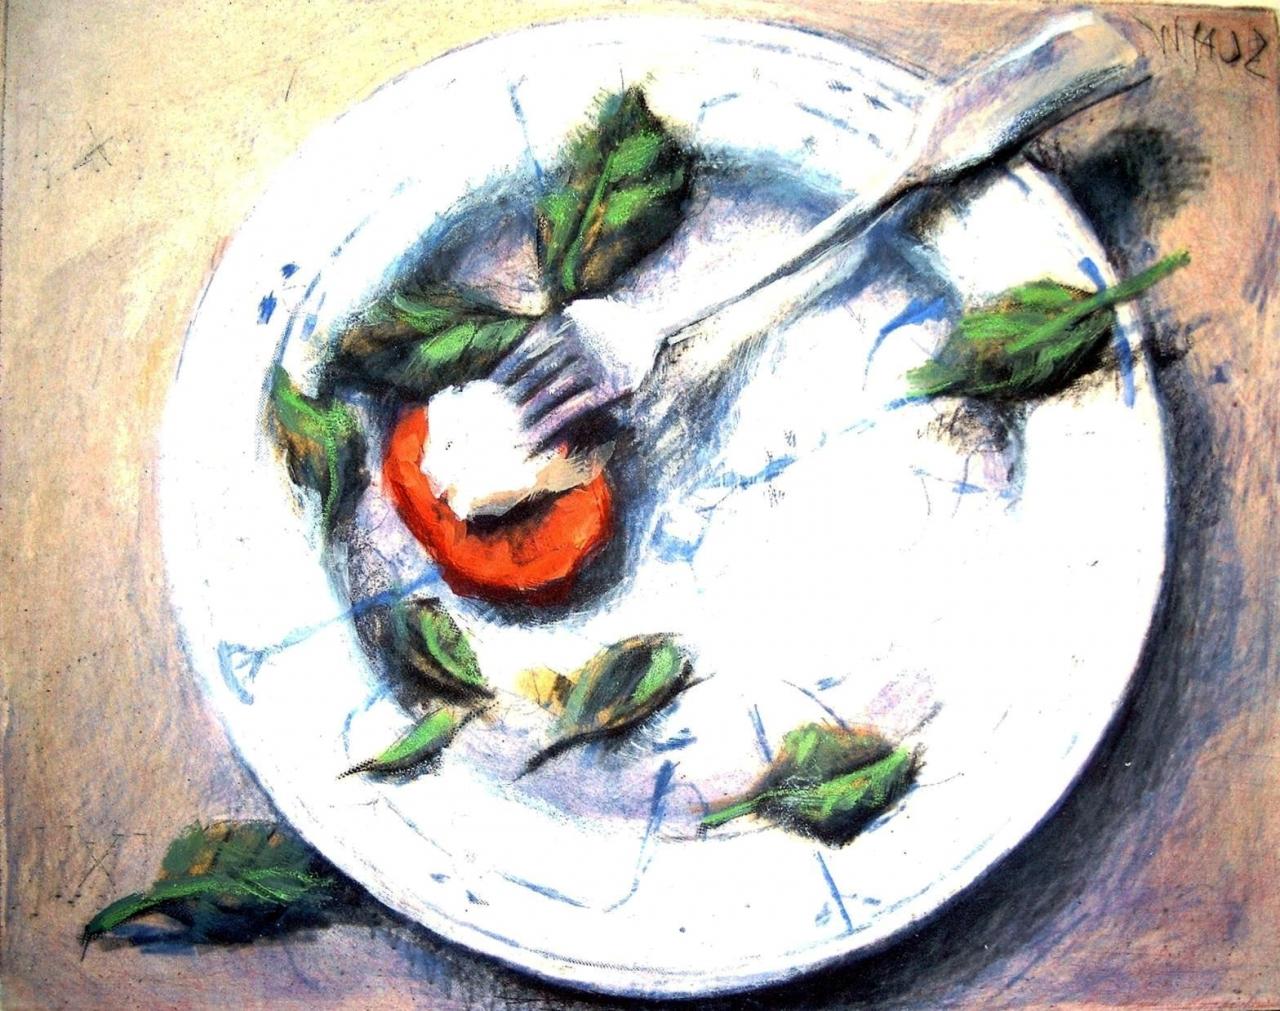 Küche - Mozarella Basilikum